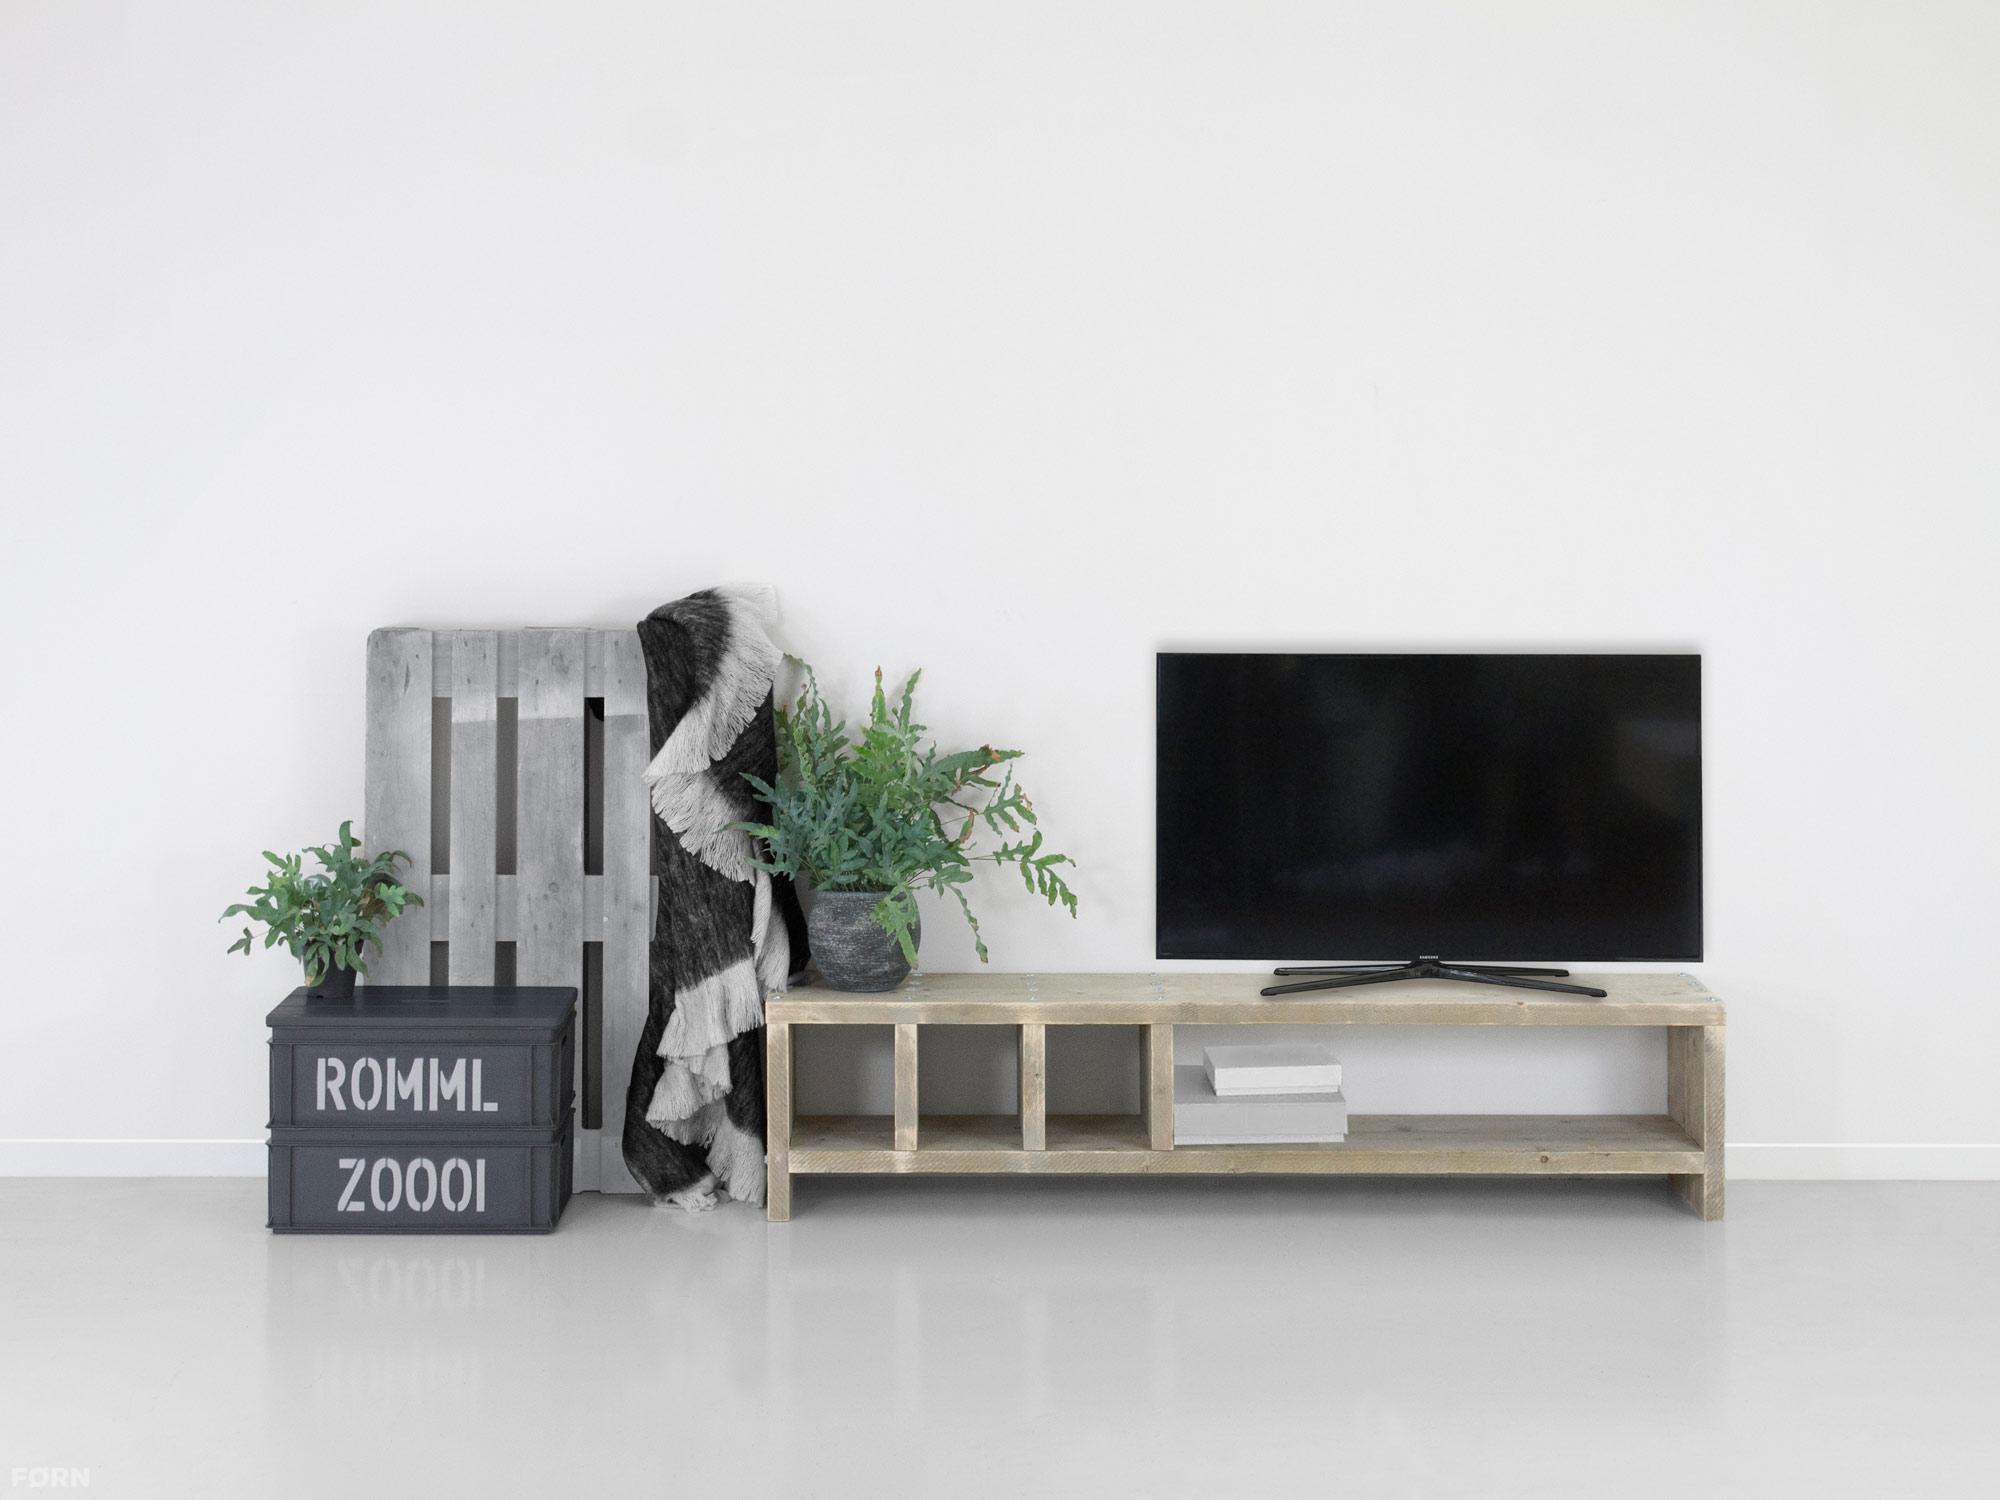 Steigerhout Tv Kast : Steigerhout tv meubel mees fØrn tv meubels van steigerhout